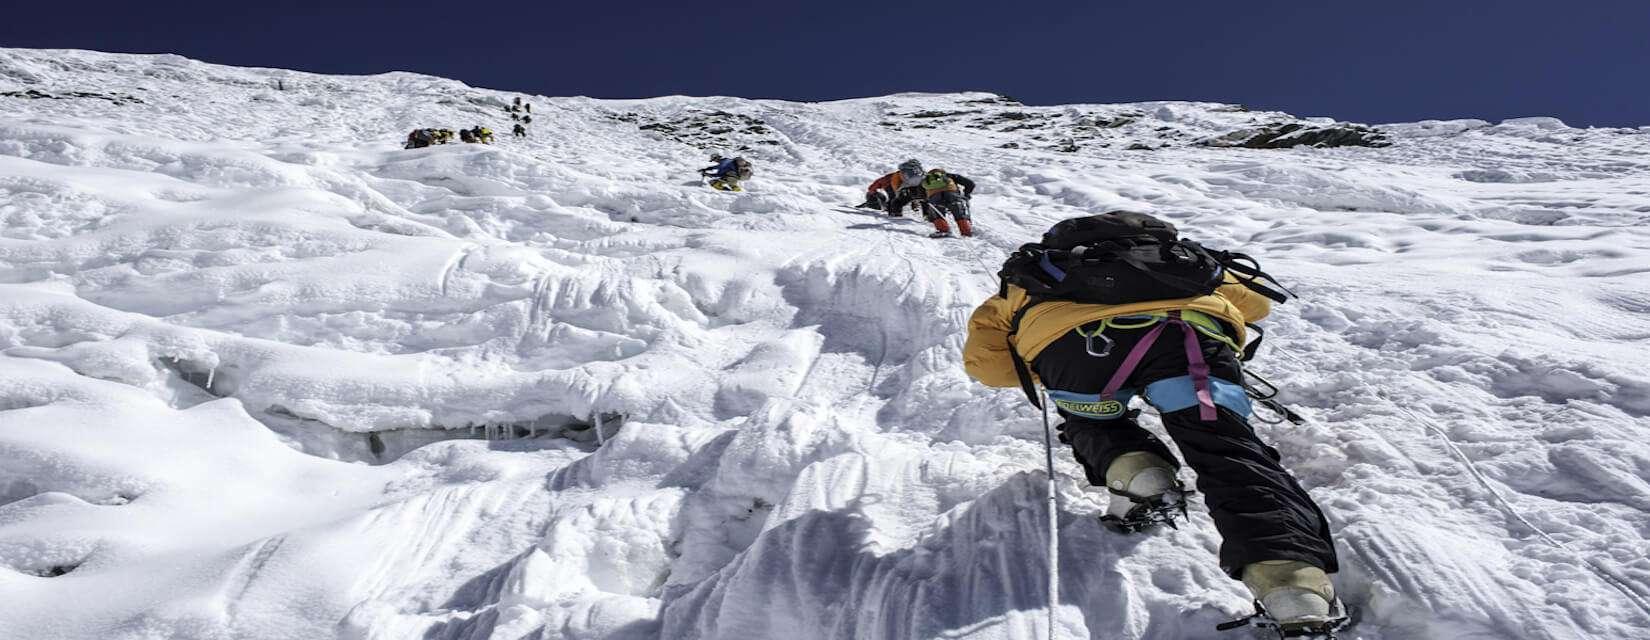 Pharchamo Peak Climbing